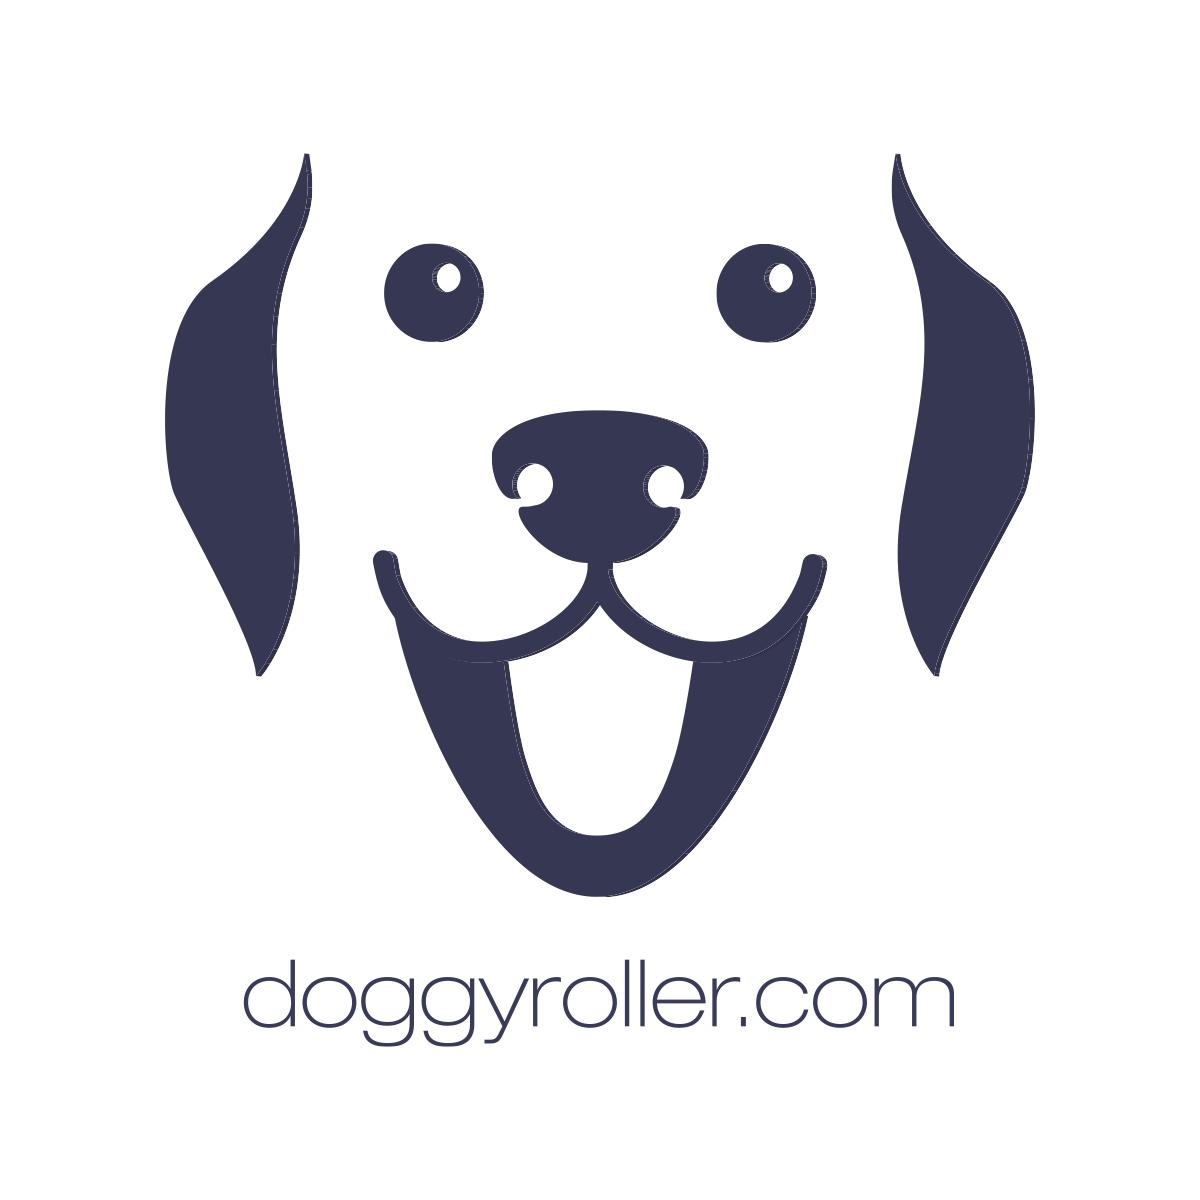 Doggyroller